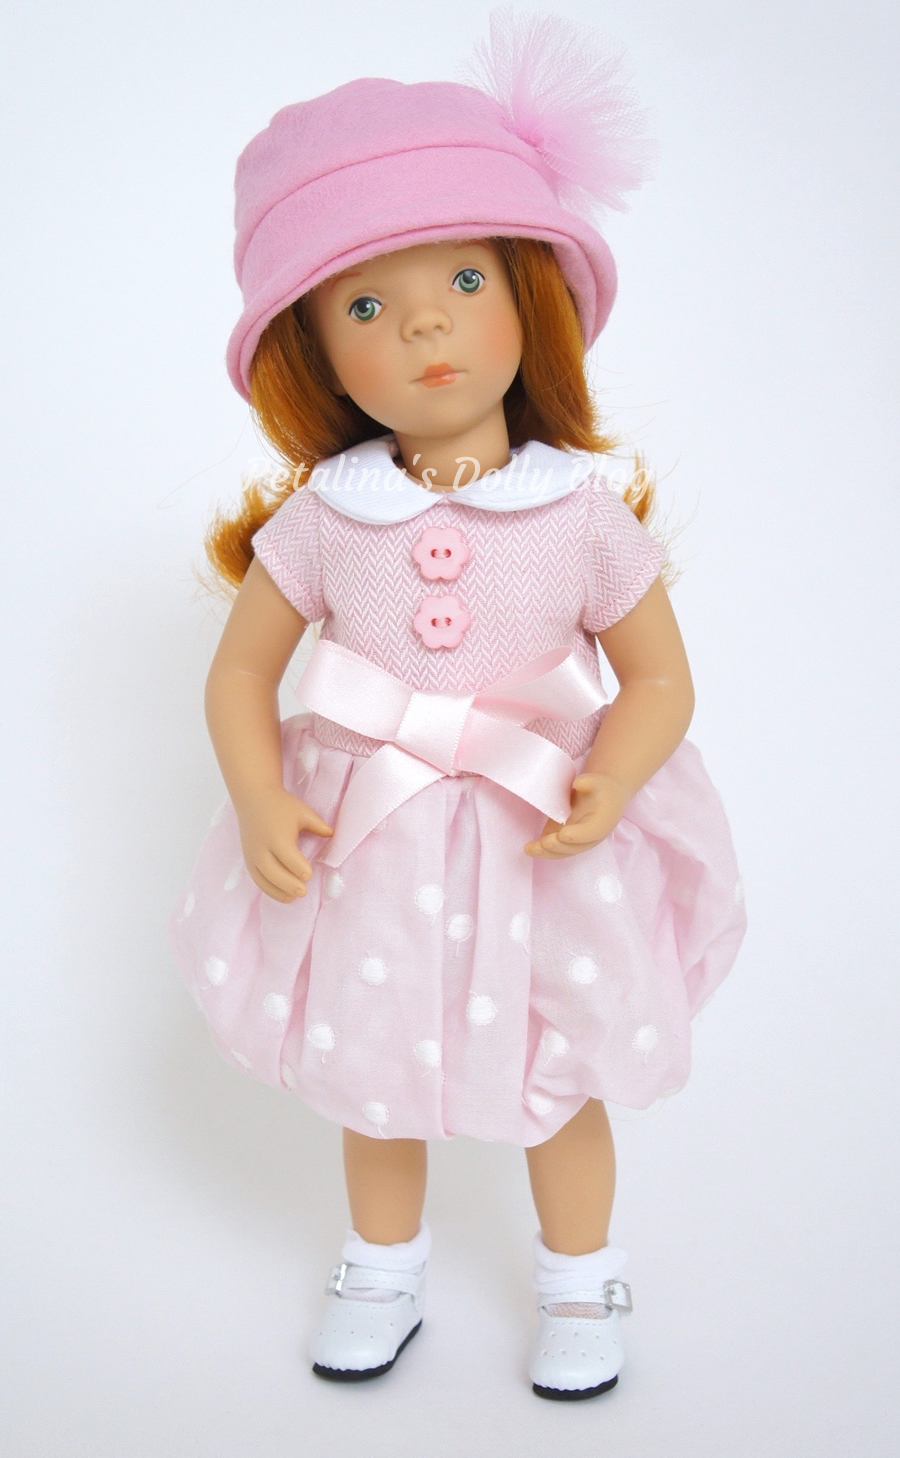 Petitcollin dolls Minouche Natalie